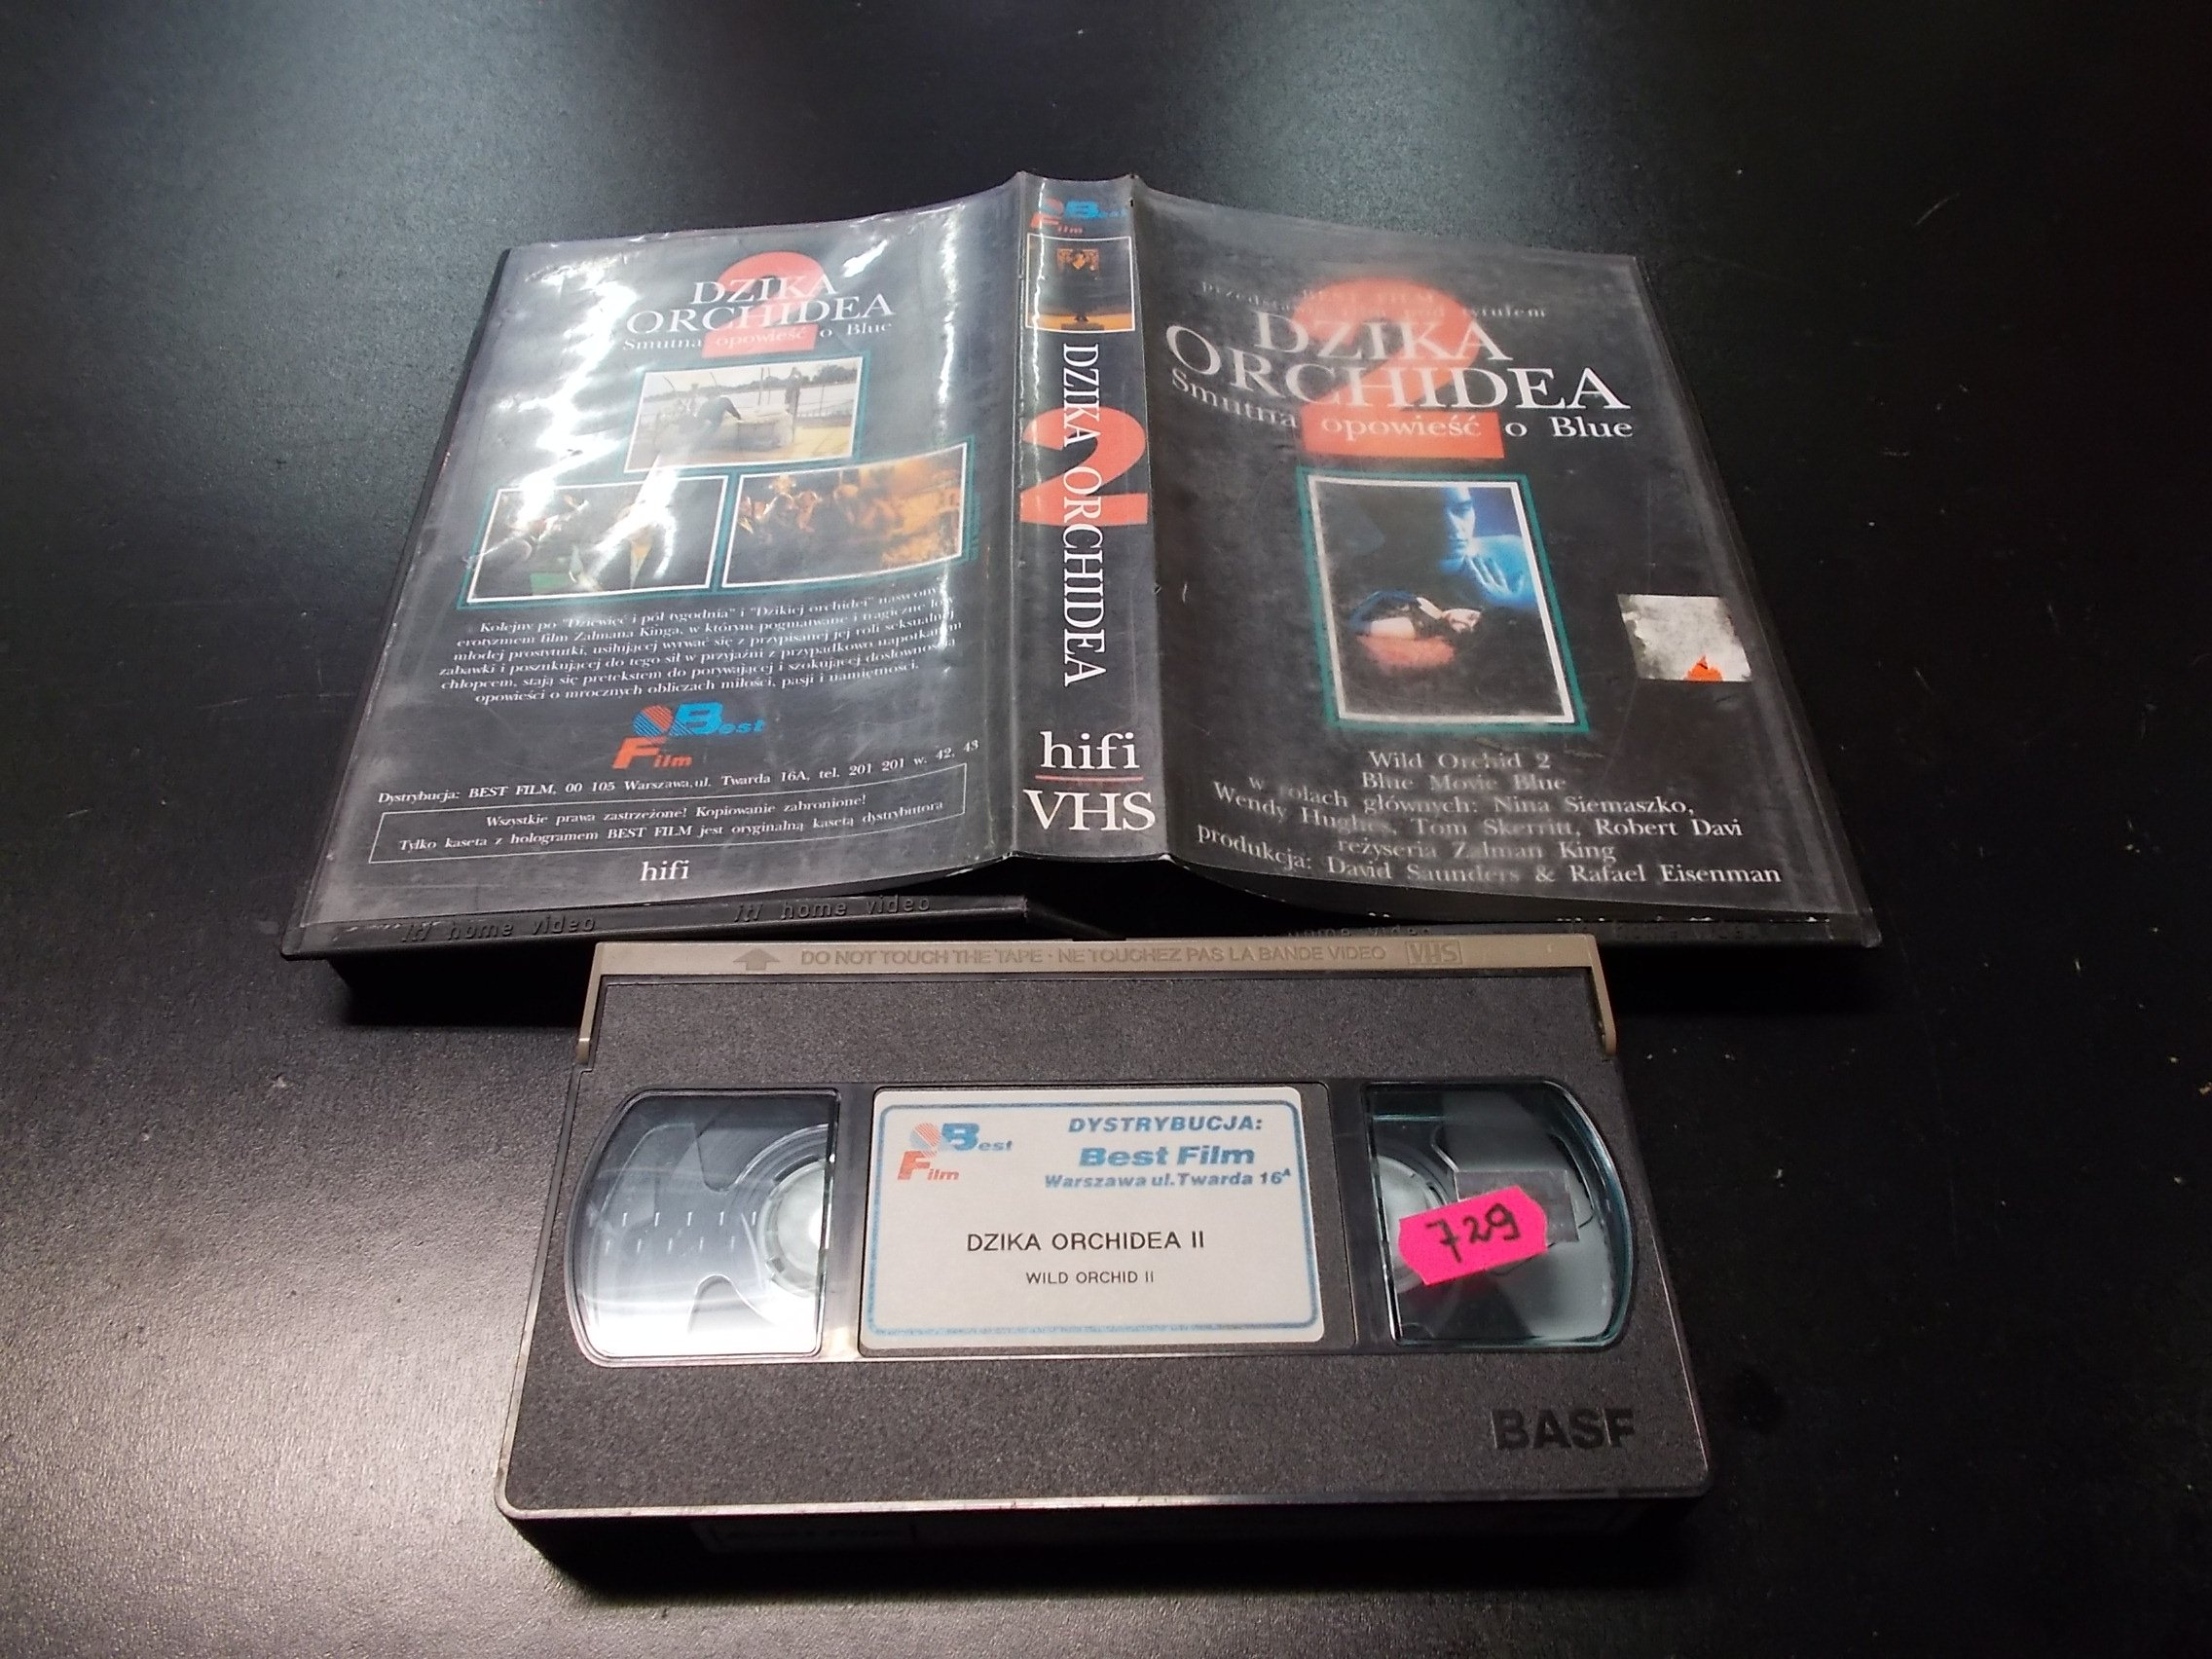 DZIKA ORCHIDEA -  kaseta VHS - 1165 Opole - AlleOpole.pl